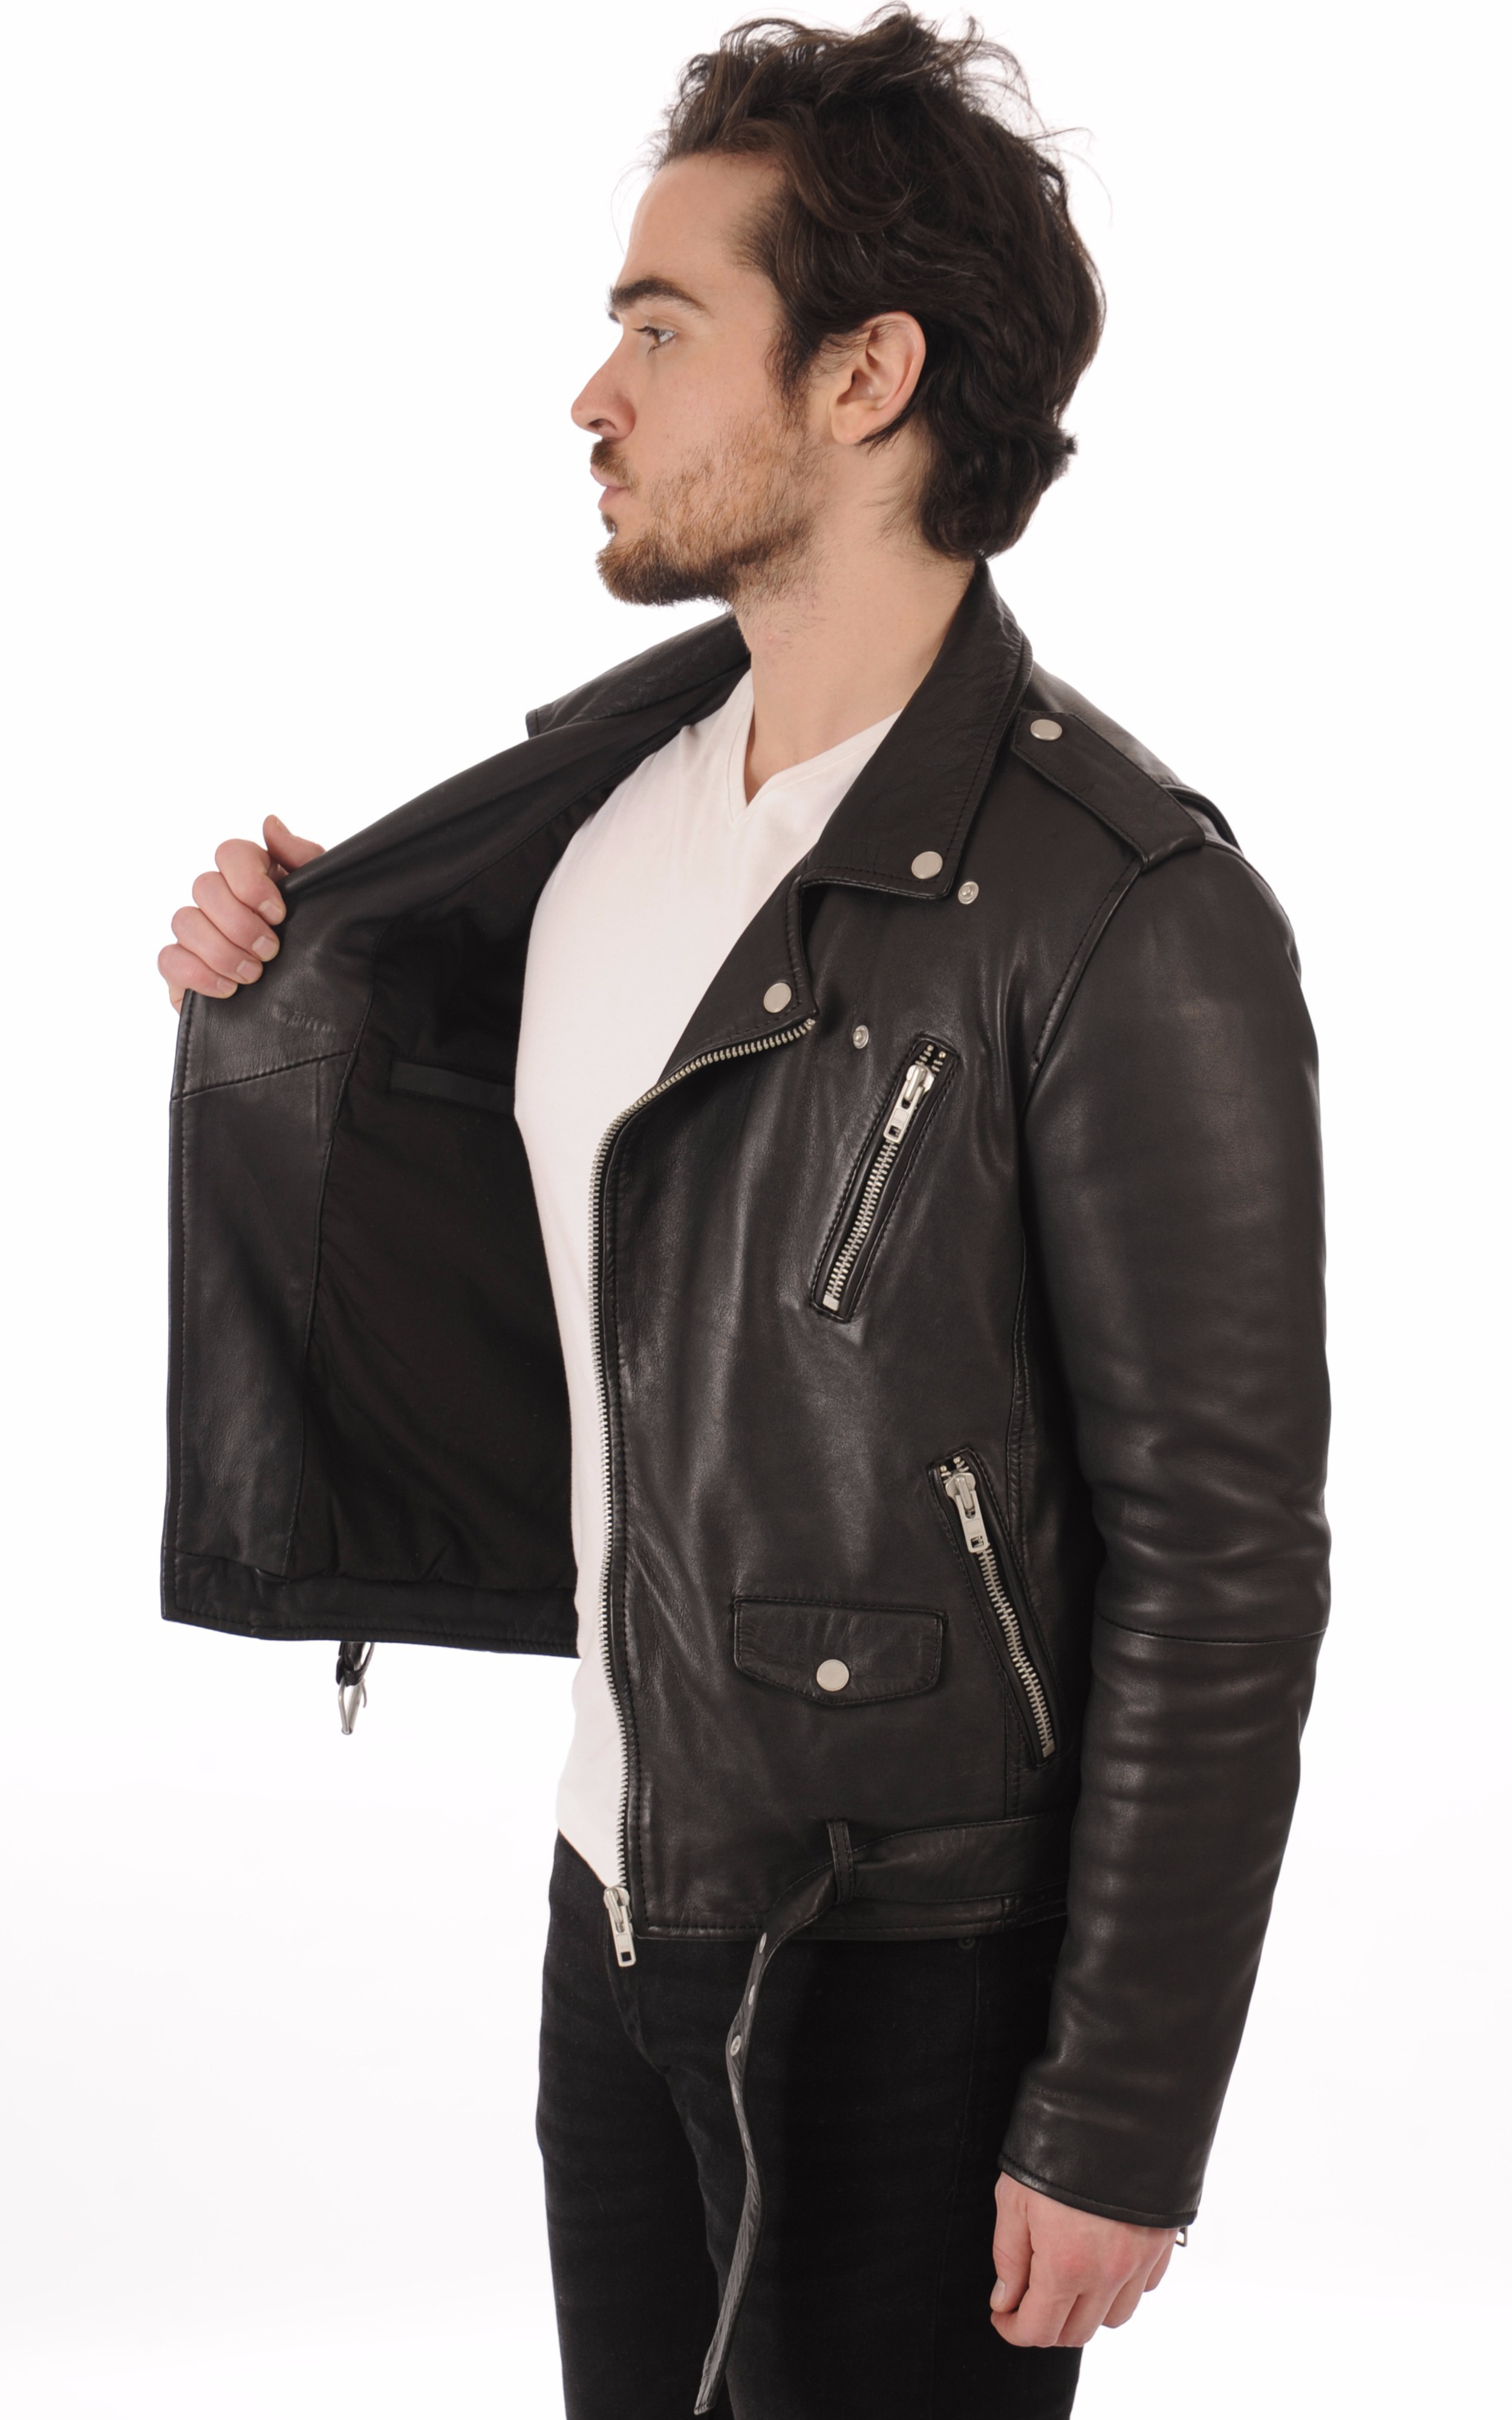 Blouson en cuir Rocker noir Serge Pariente